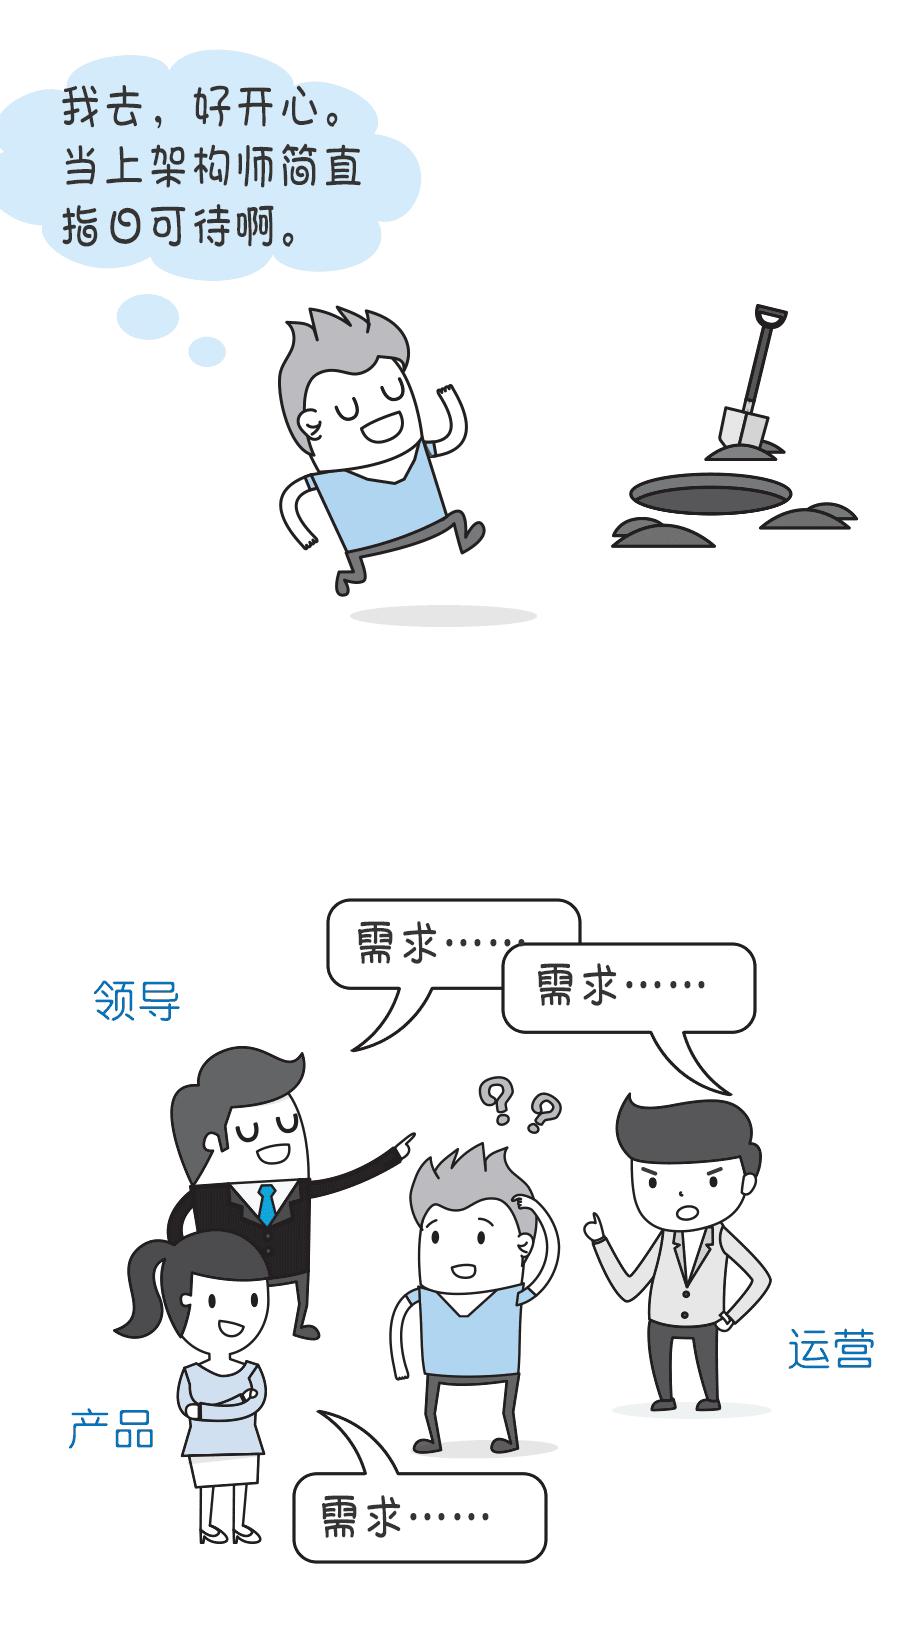 qiniu_07_08